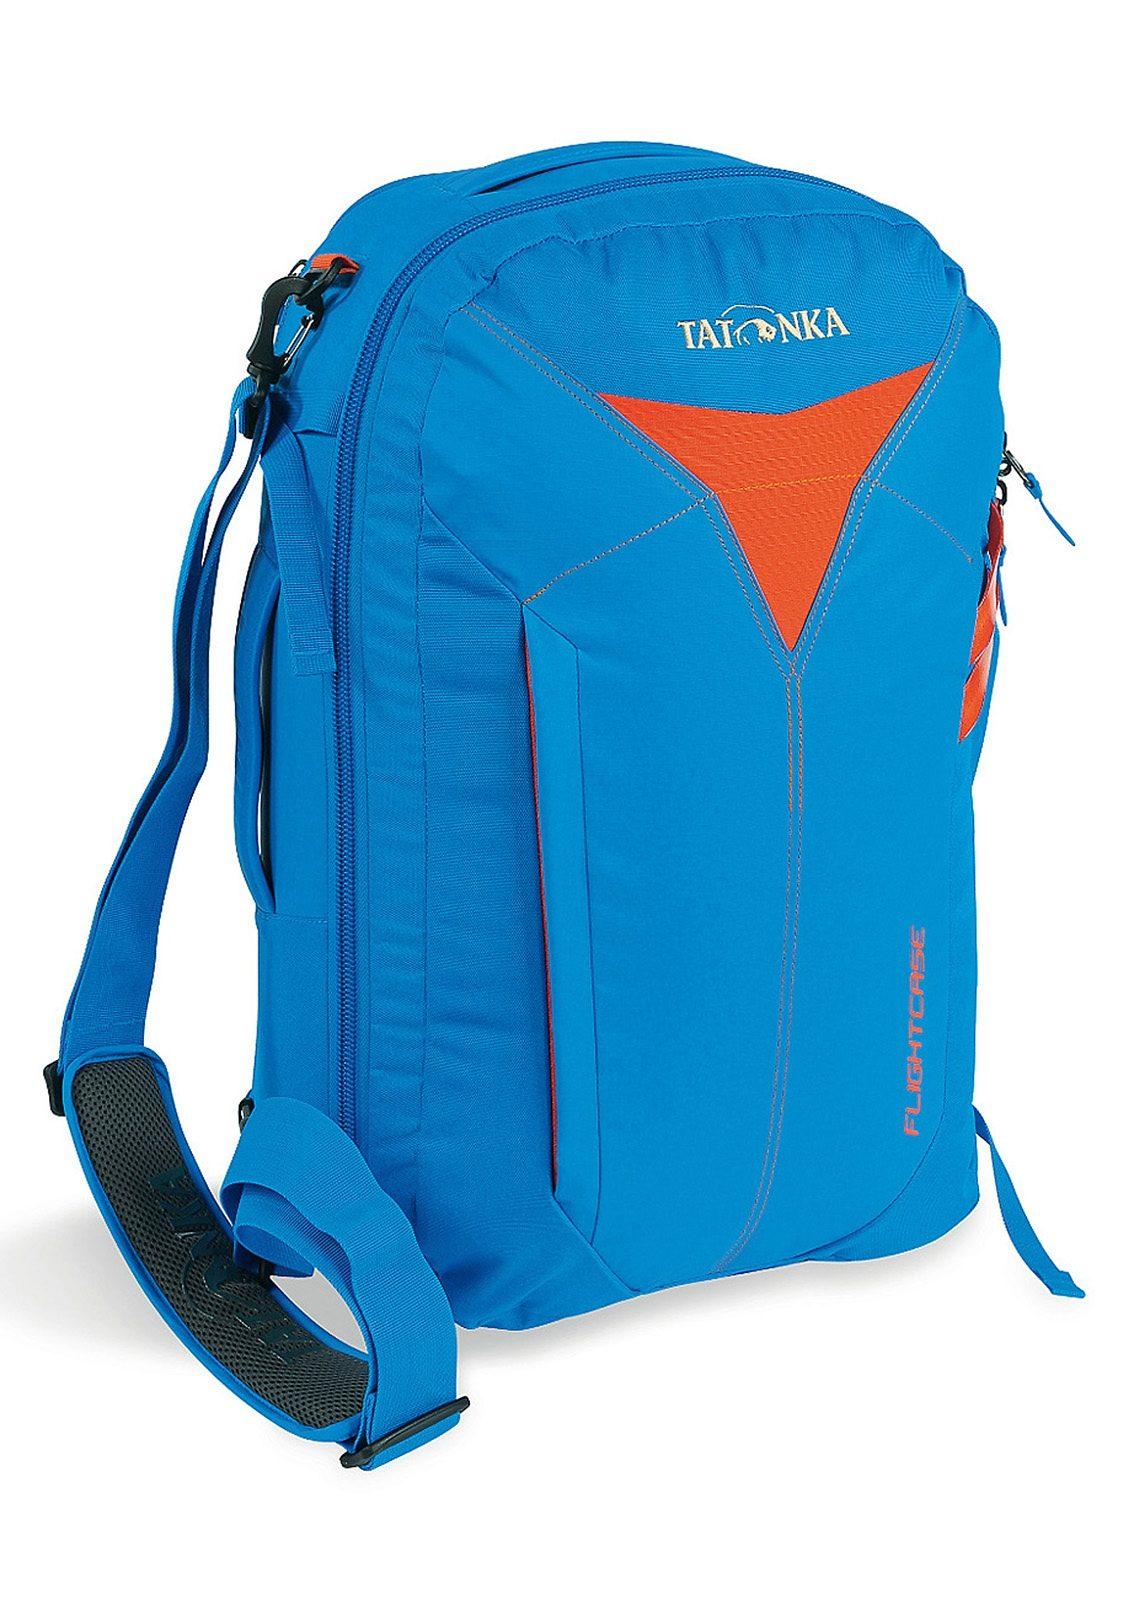 Reiserucksack mit Laptopfach, »Flightcase«, TATONKA®